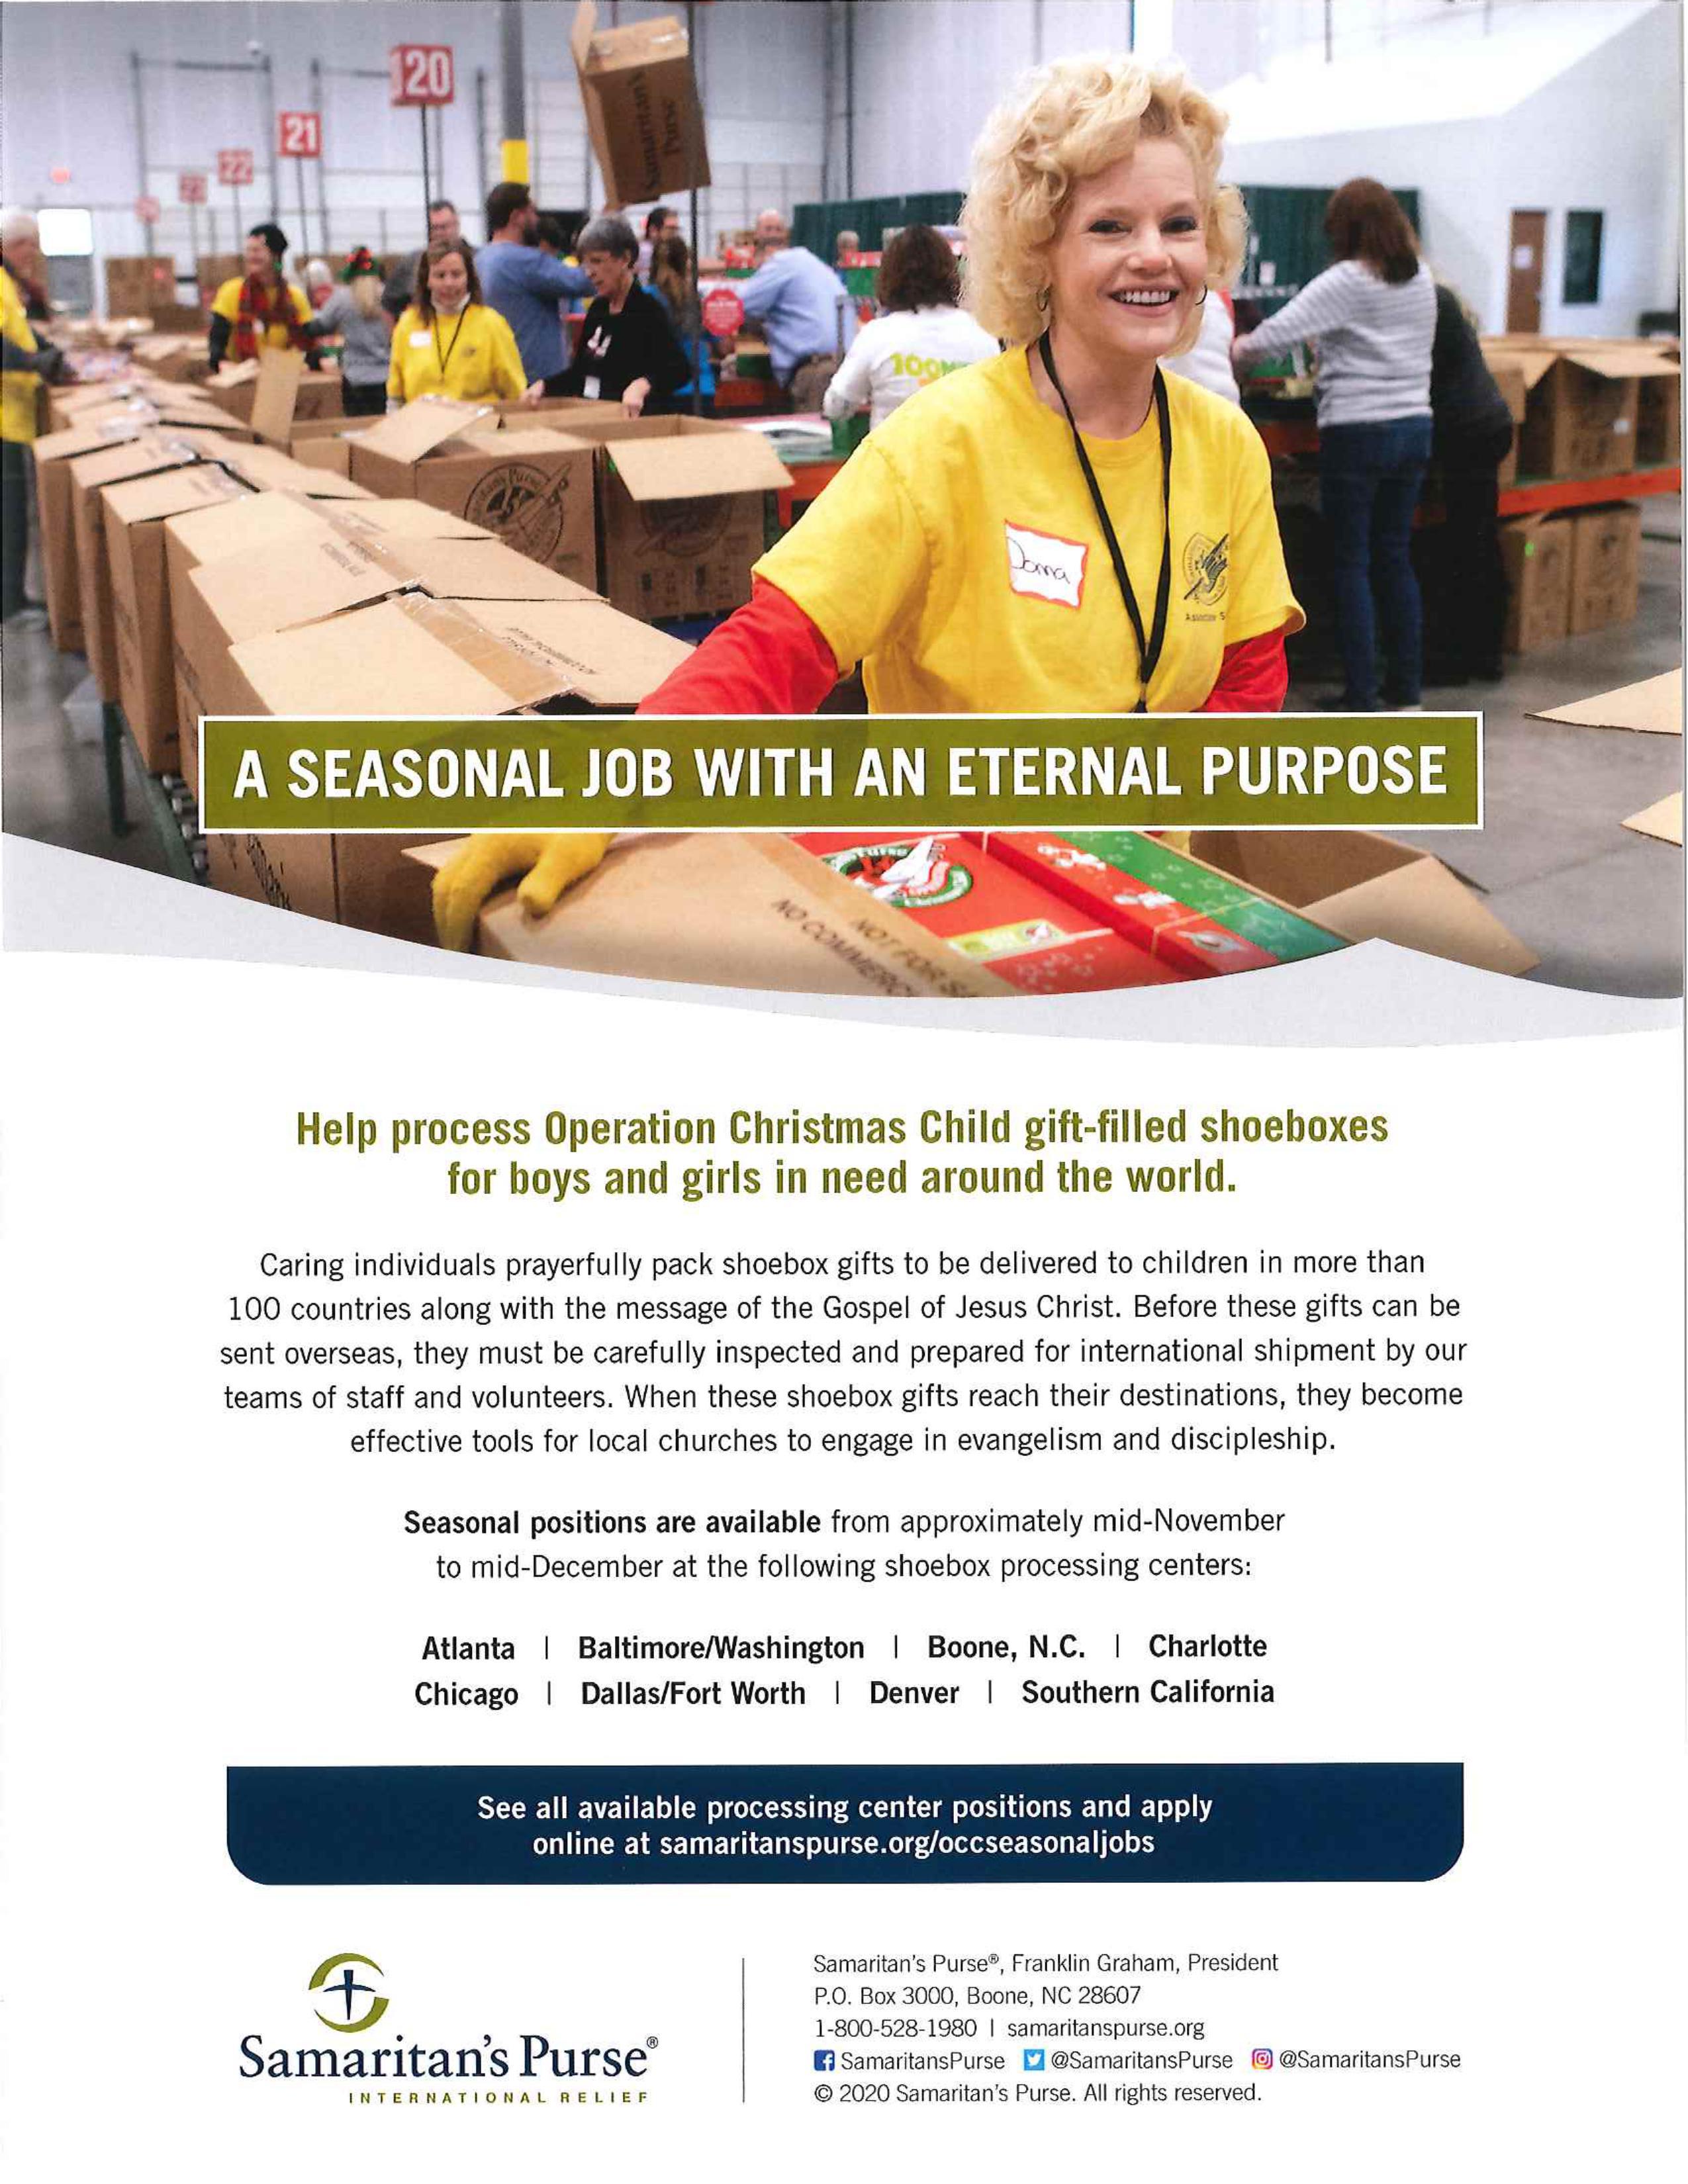 Christmas 2020 Volunteering Atlanta Job Opportunity: Samaritan's Purse, Operation Christmas Child